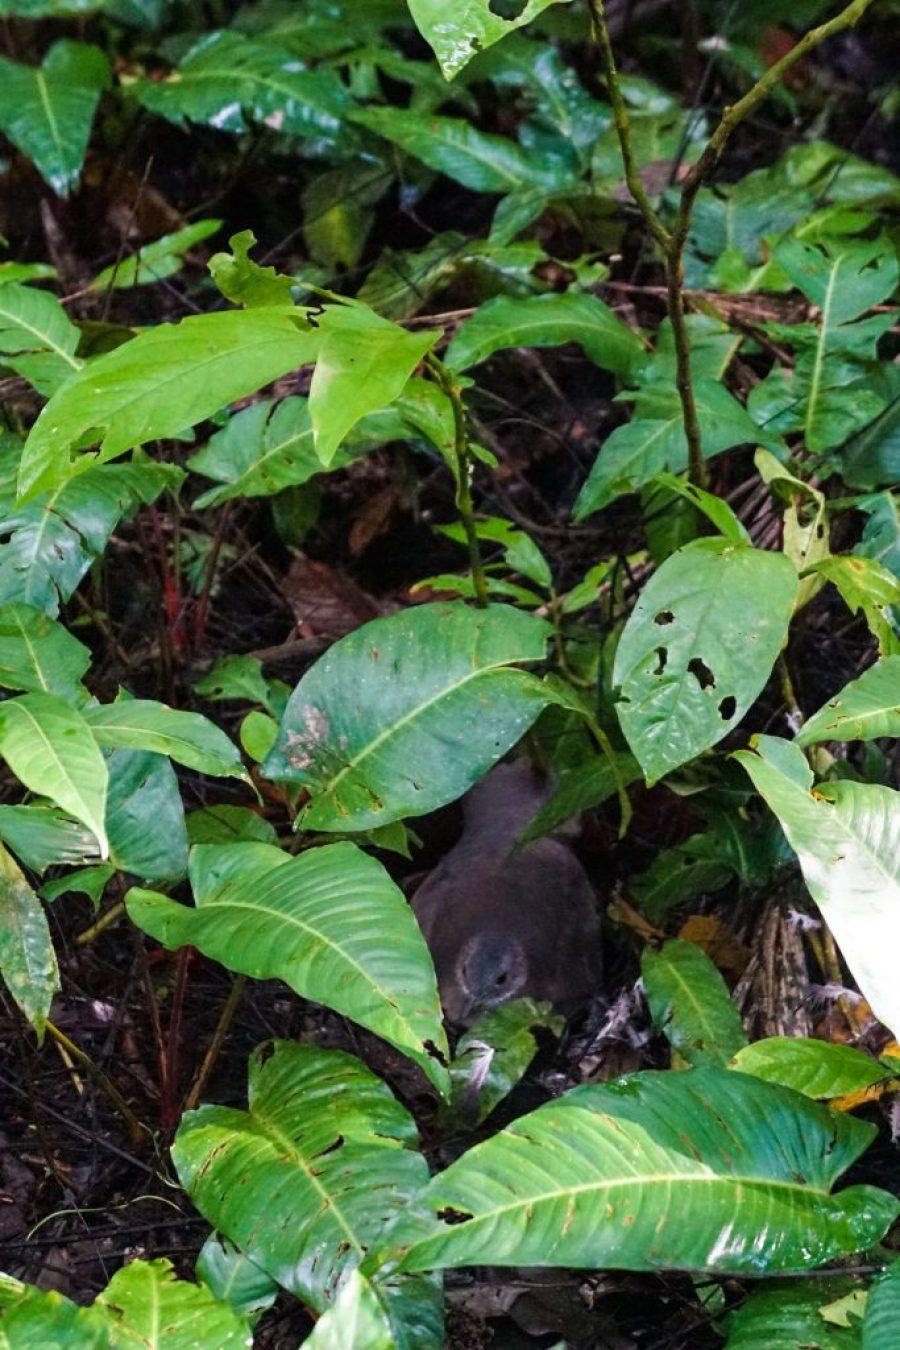 Sani Lodge Ecuador: A Amazon rainforest lodge in the Yasuni National Park